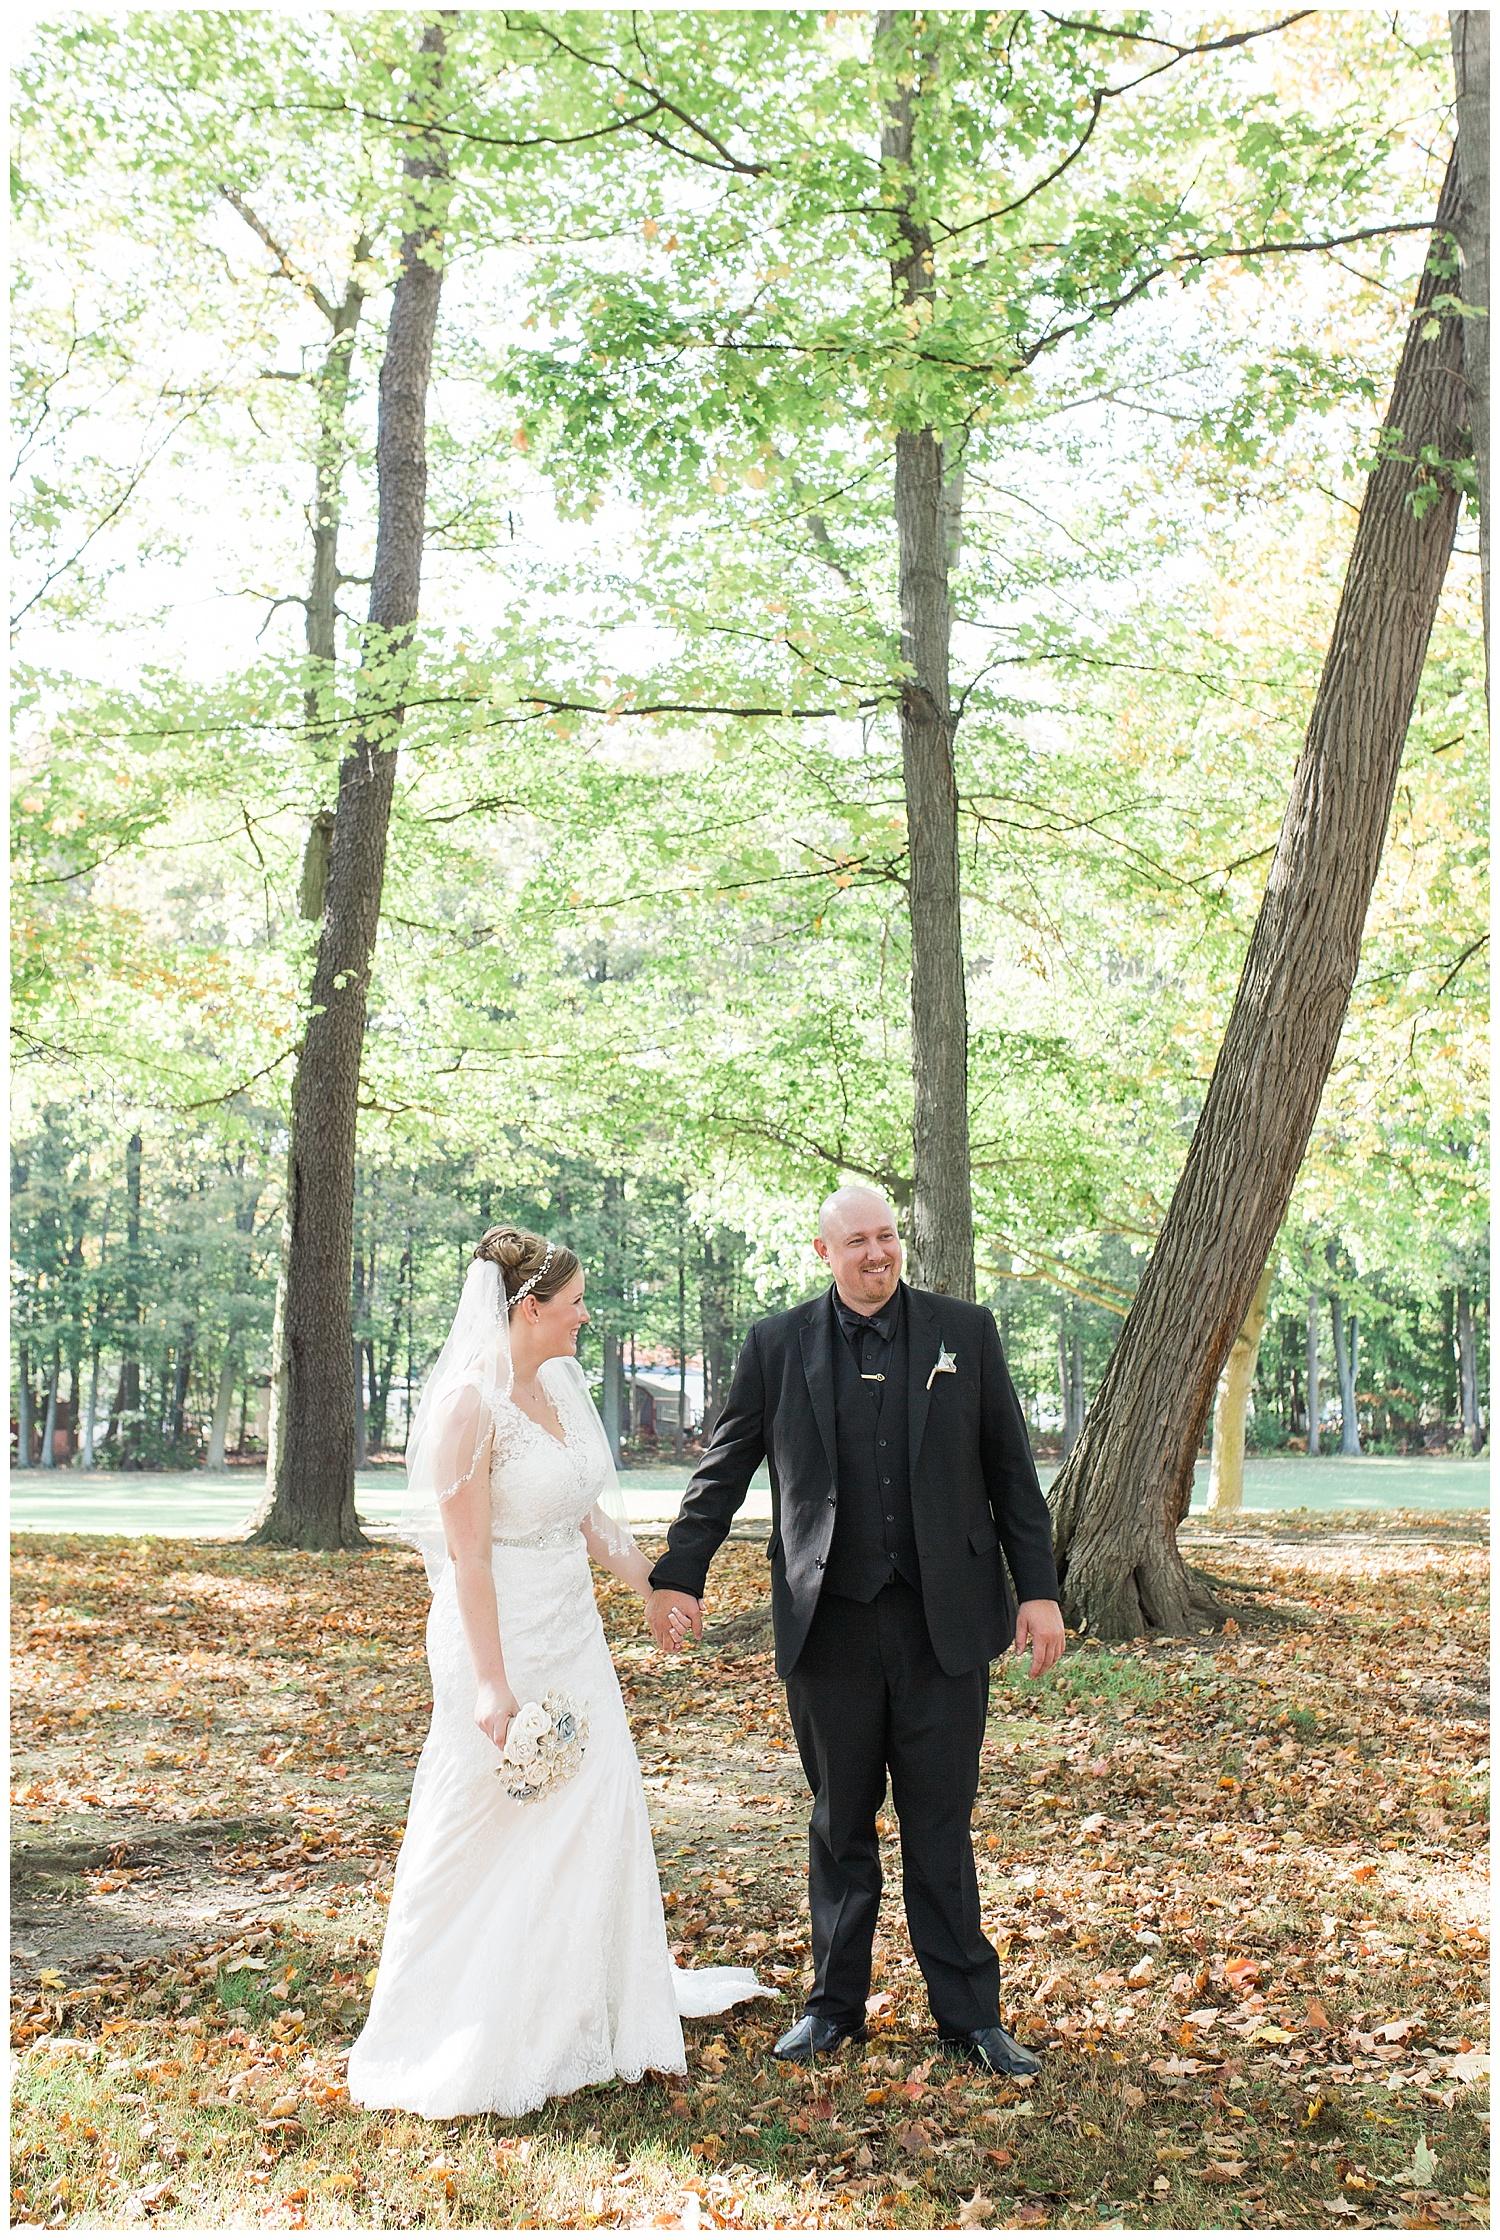 Jessica and Scott McKay - Terry Hills Golf Course - Batavia NY - Lass and Beau-317_Buffalo wedding photography.jpg